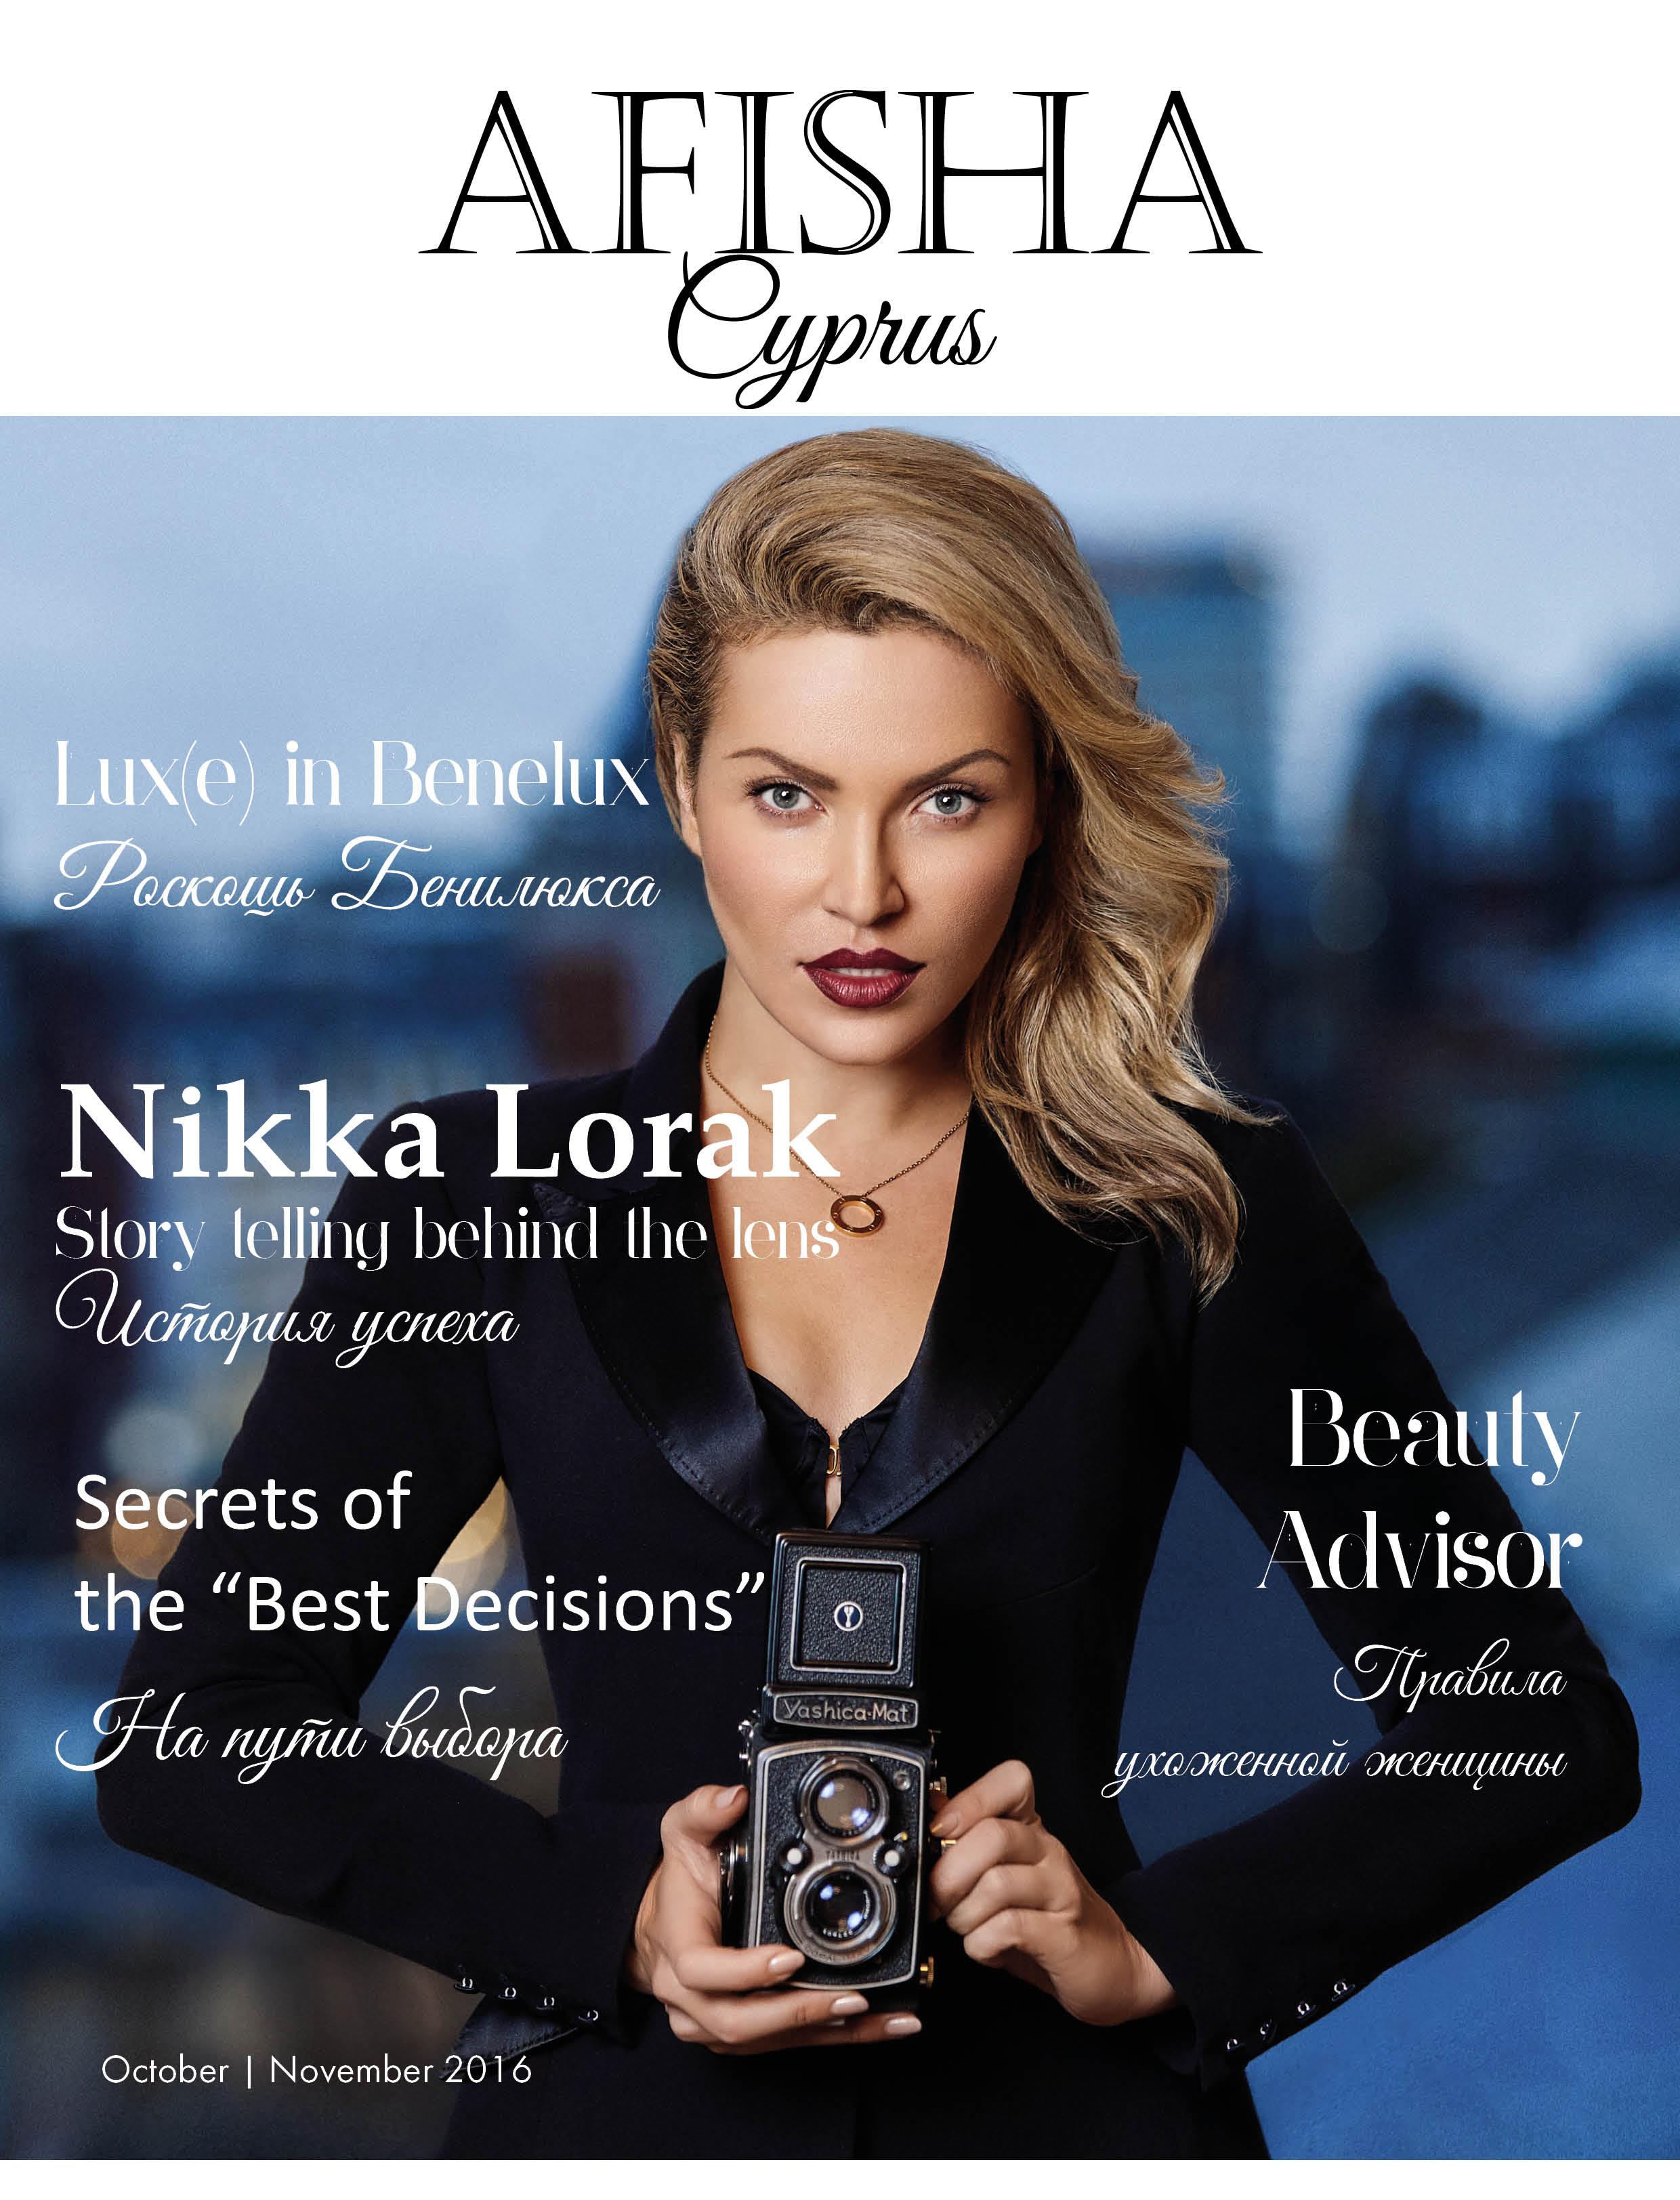 Media: Lorak began divorce proceedings